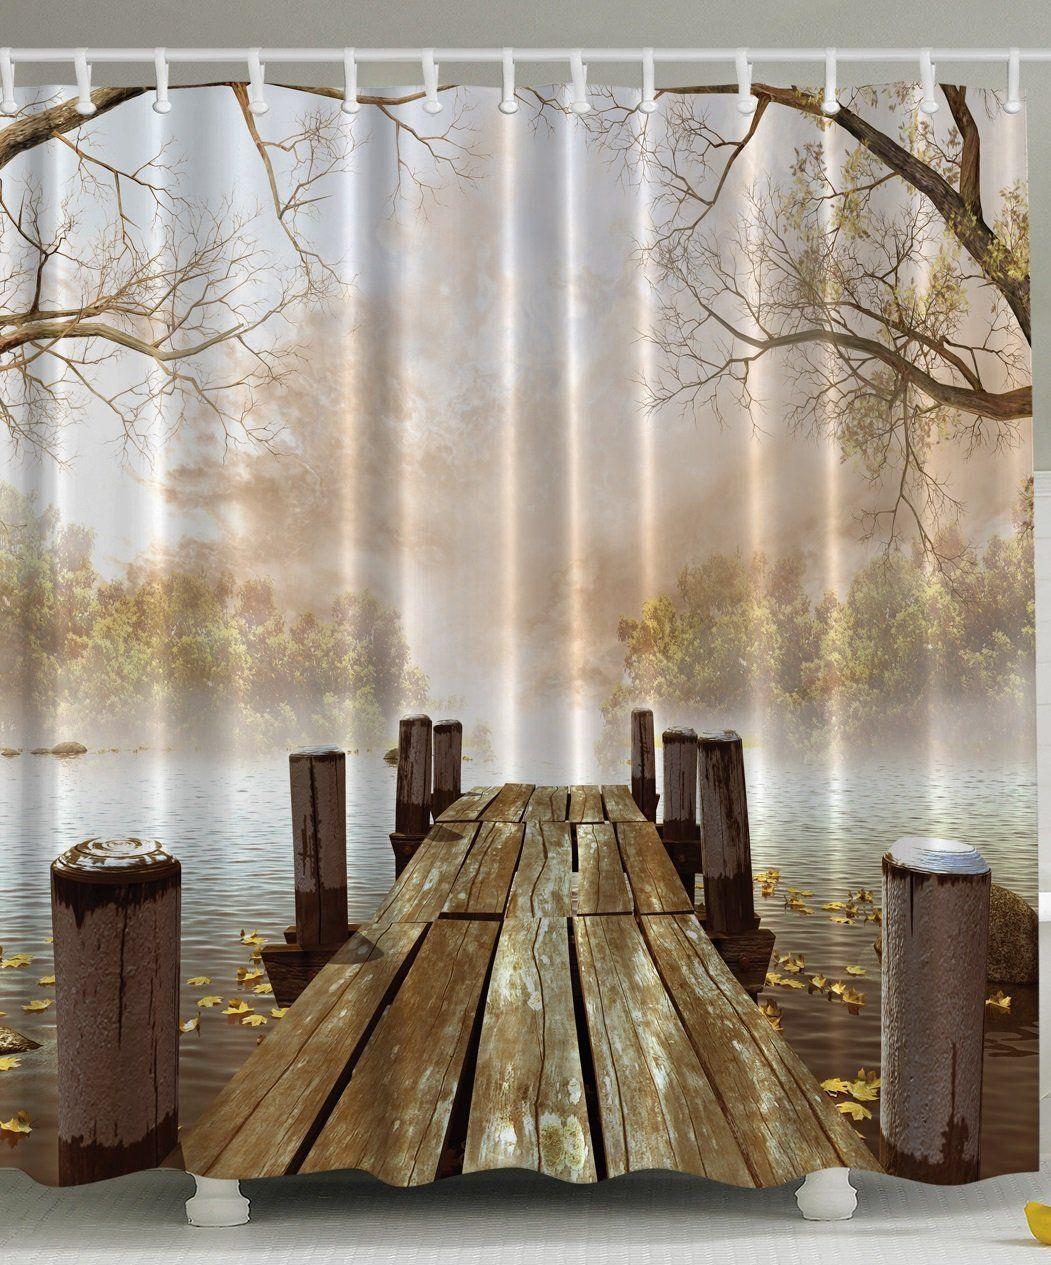 Country Lake Apartments: Amazon.com: Ocean Decor Fall Wooden Bridge Seasons Mother